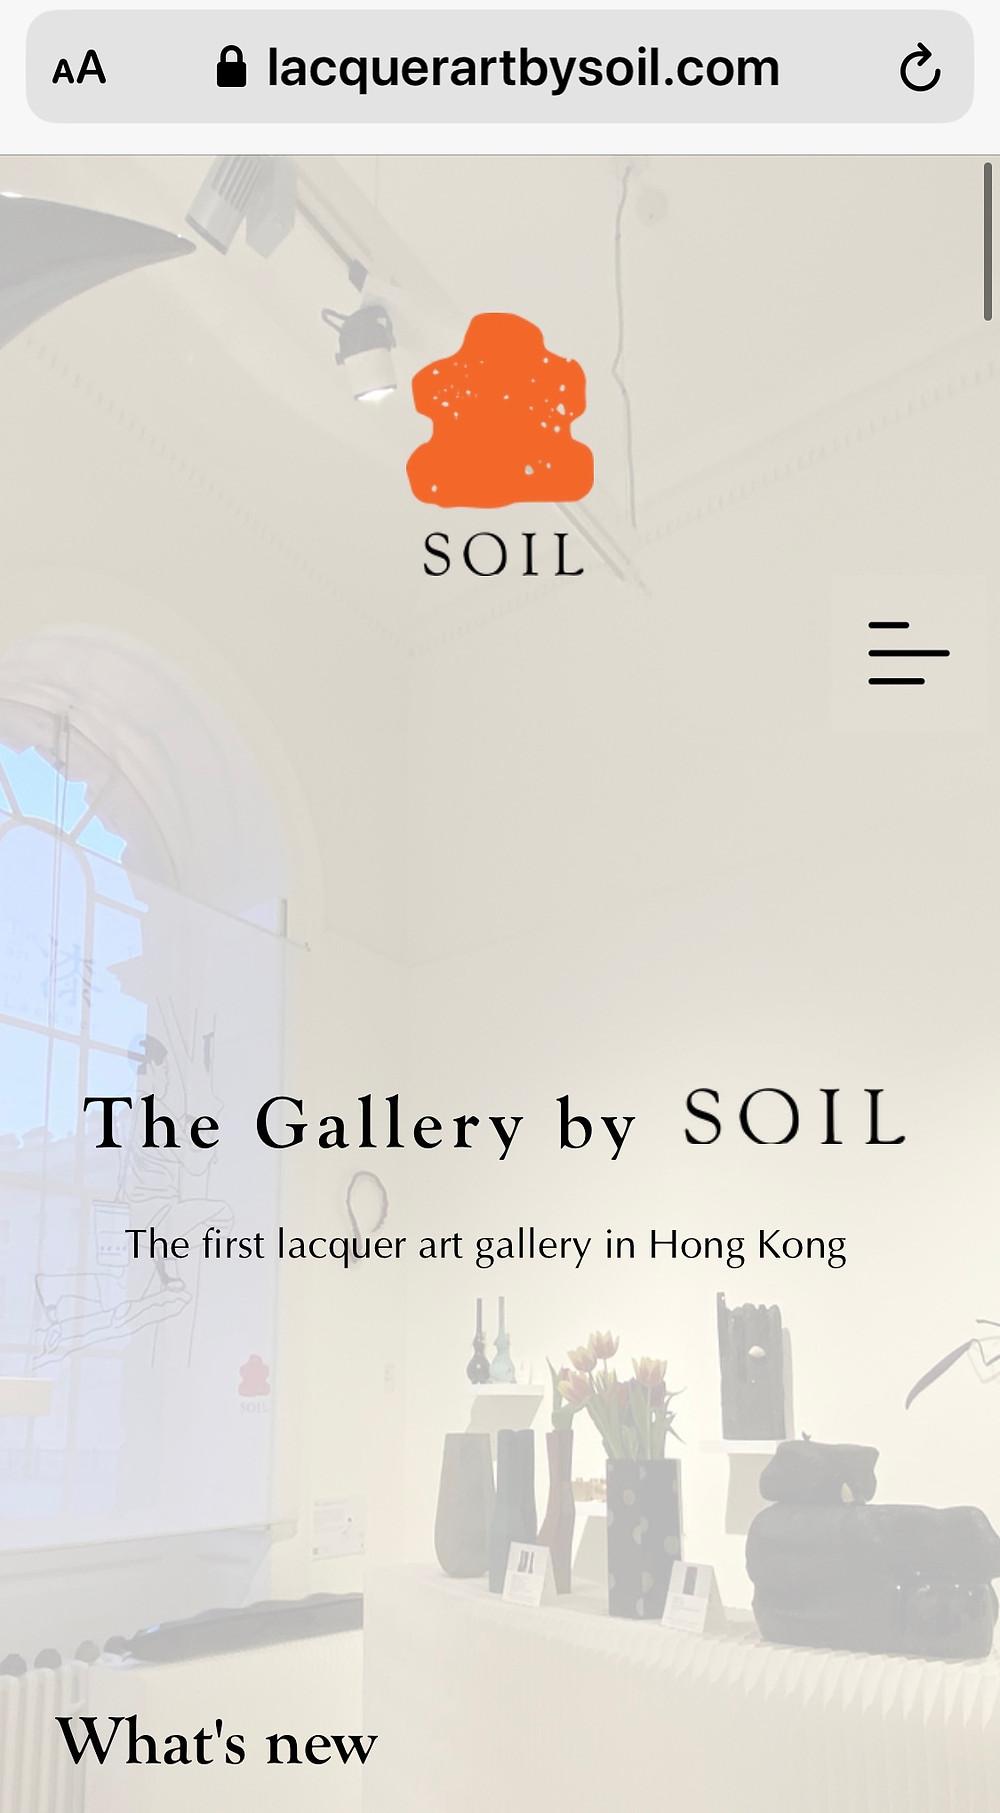 SOIL-Lacquerartbysoil.com